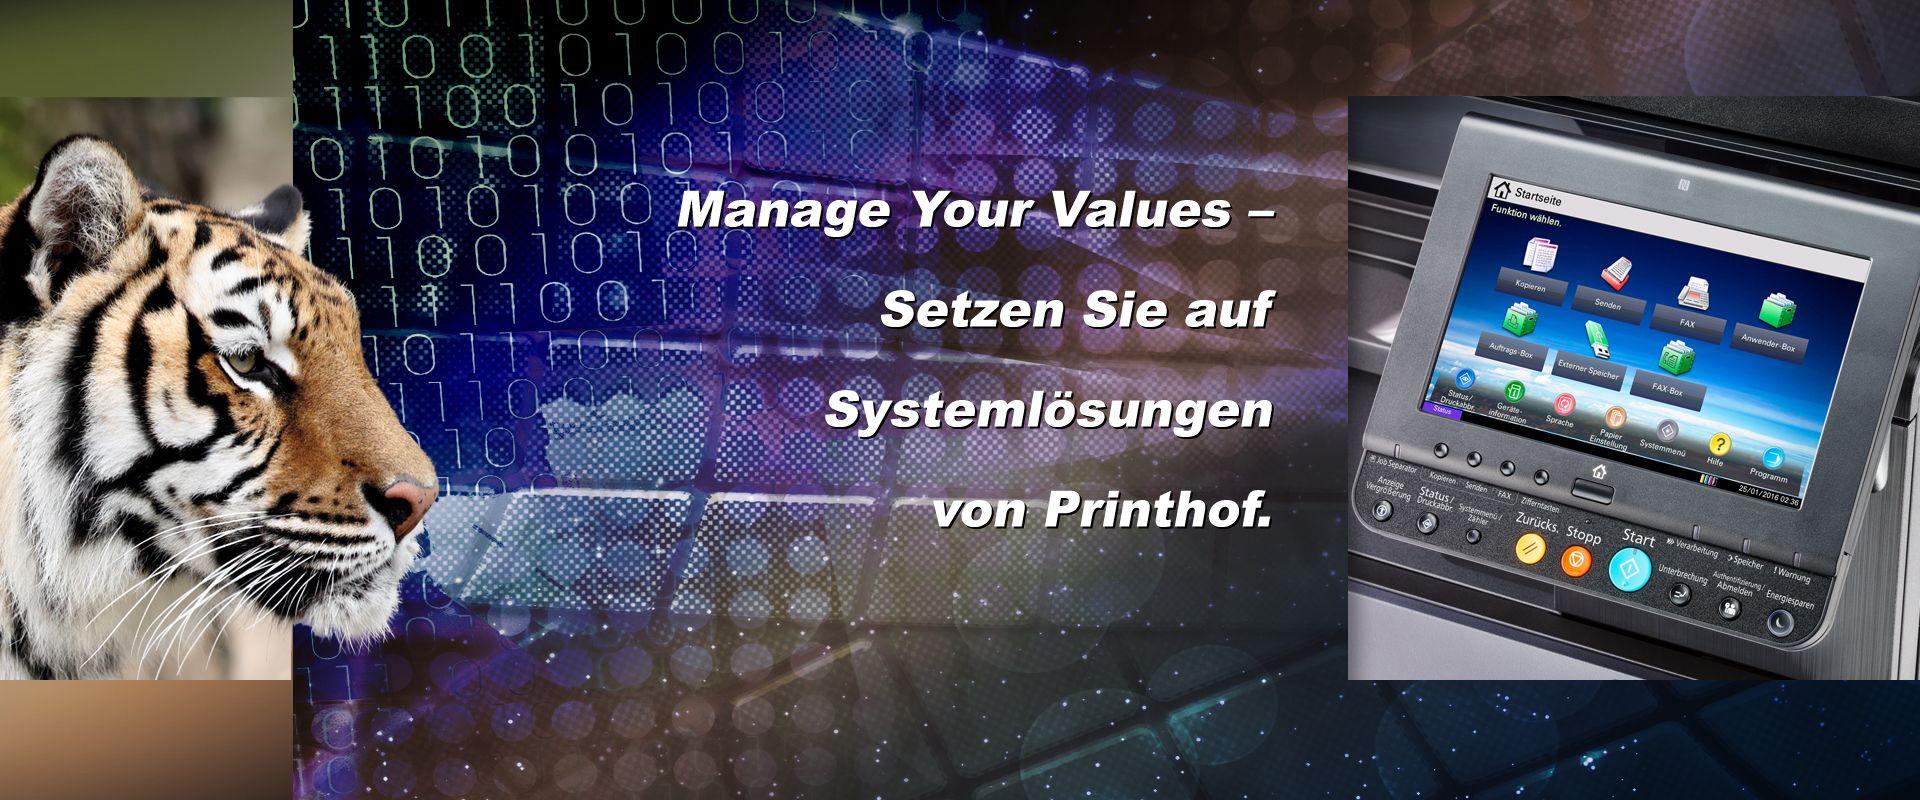 Kyocera Farb-Systeme by Printhof